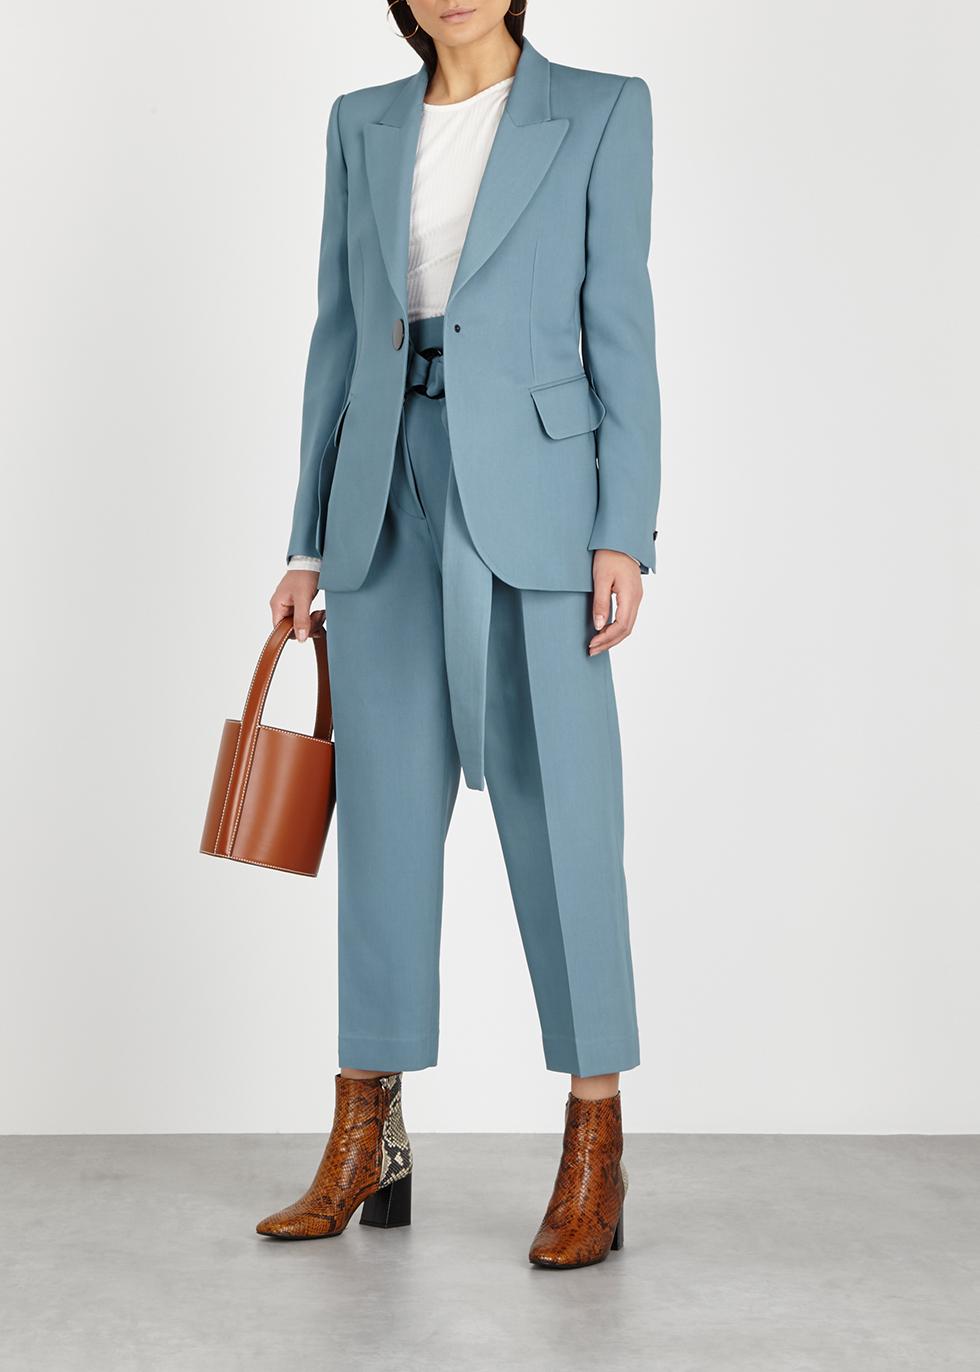 Jovan blue wool-blend blazer - Petar Petrov